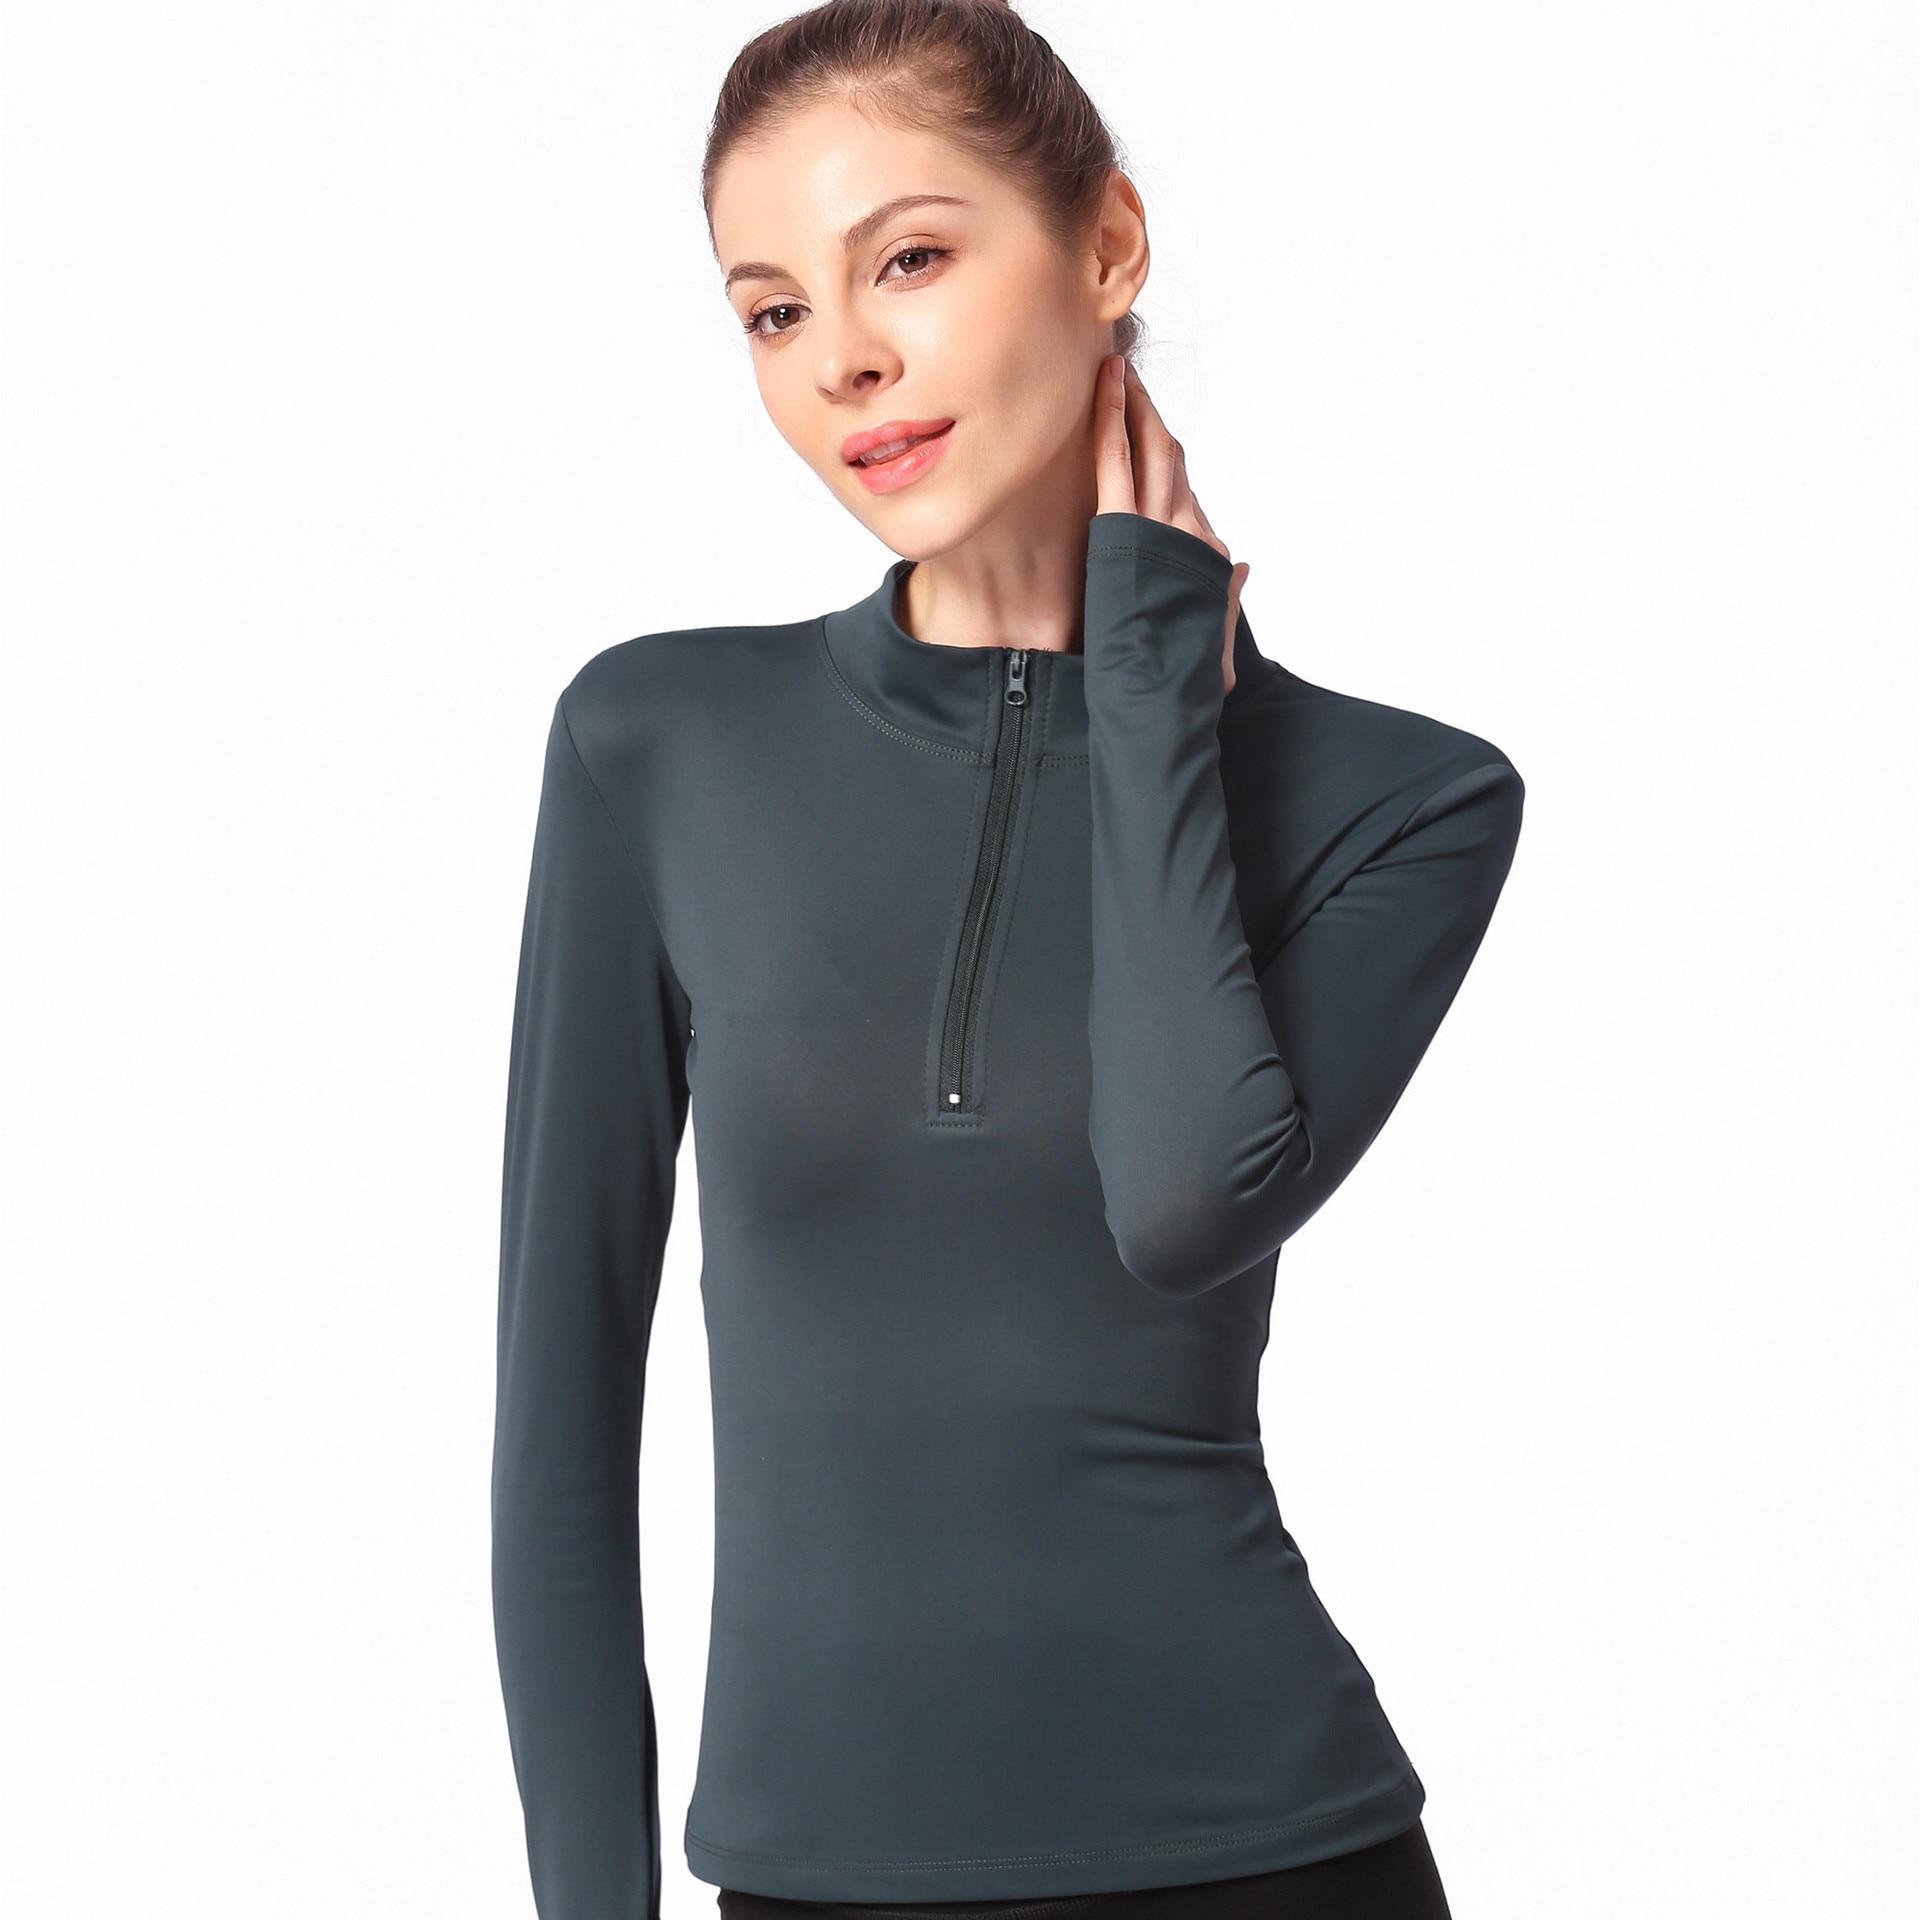 Yoga Shirt Women Long Sleeve Sports T Shirt Fitness Clothing Running Shirts Quick Dry Yoga Shirts Sports Wear for Women in Yoga Shirts from Sports Entertainment